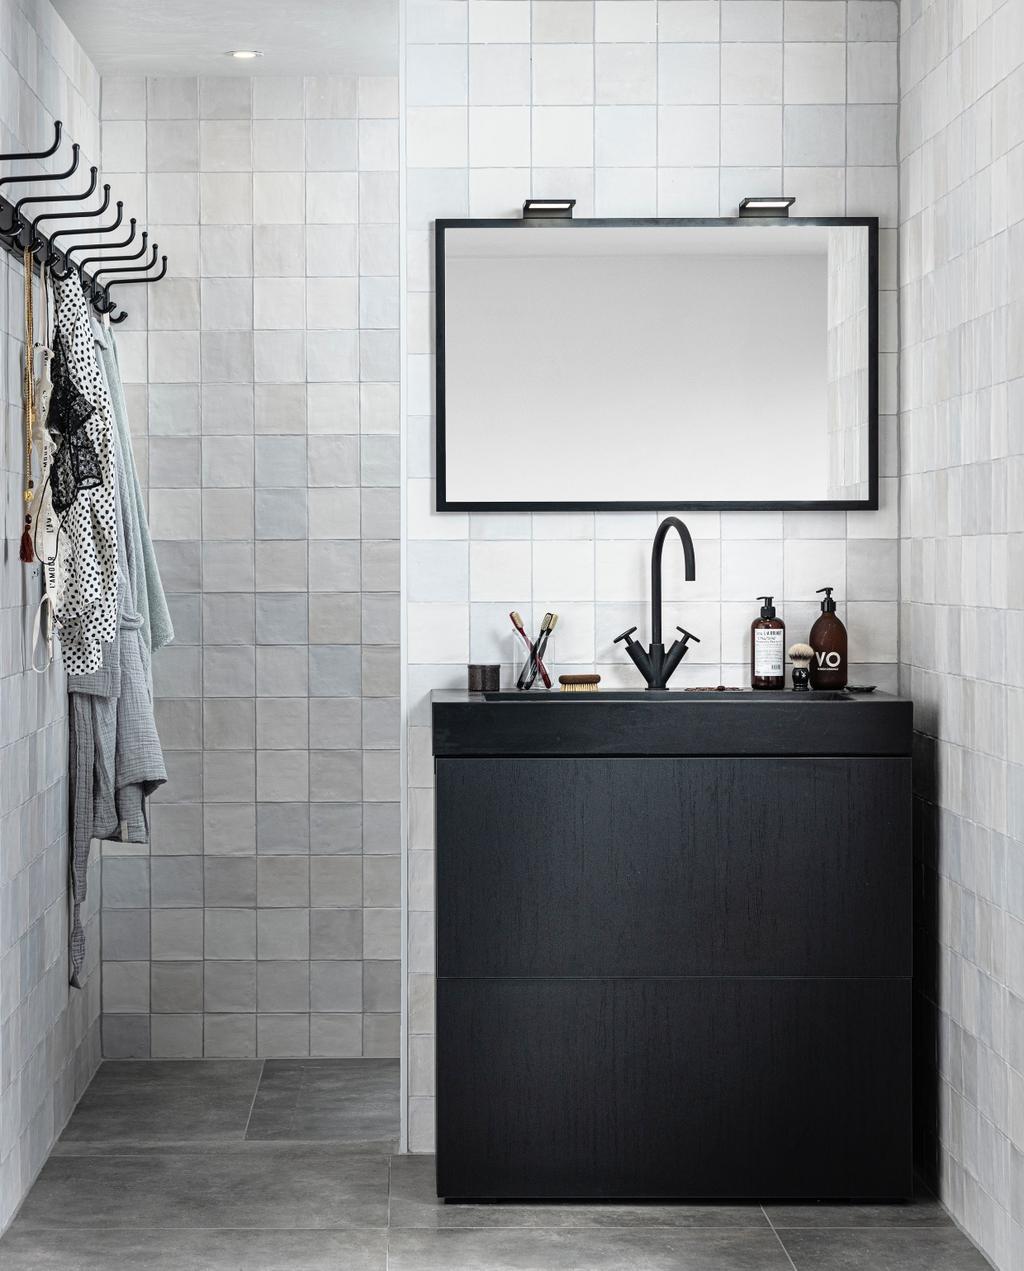 vtwonen collectie 08-2020 badkamer zwarte wastafel met spiegel